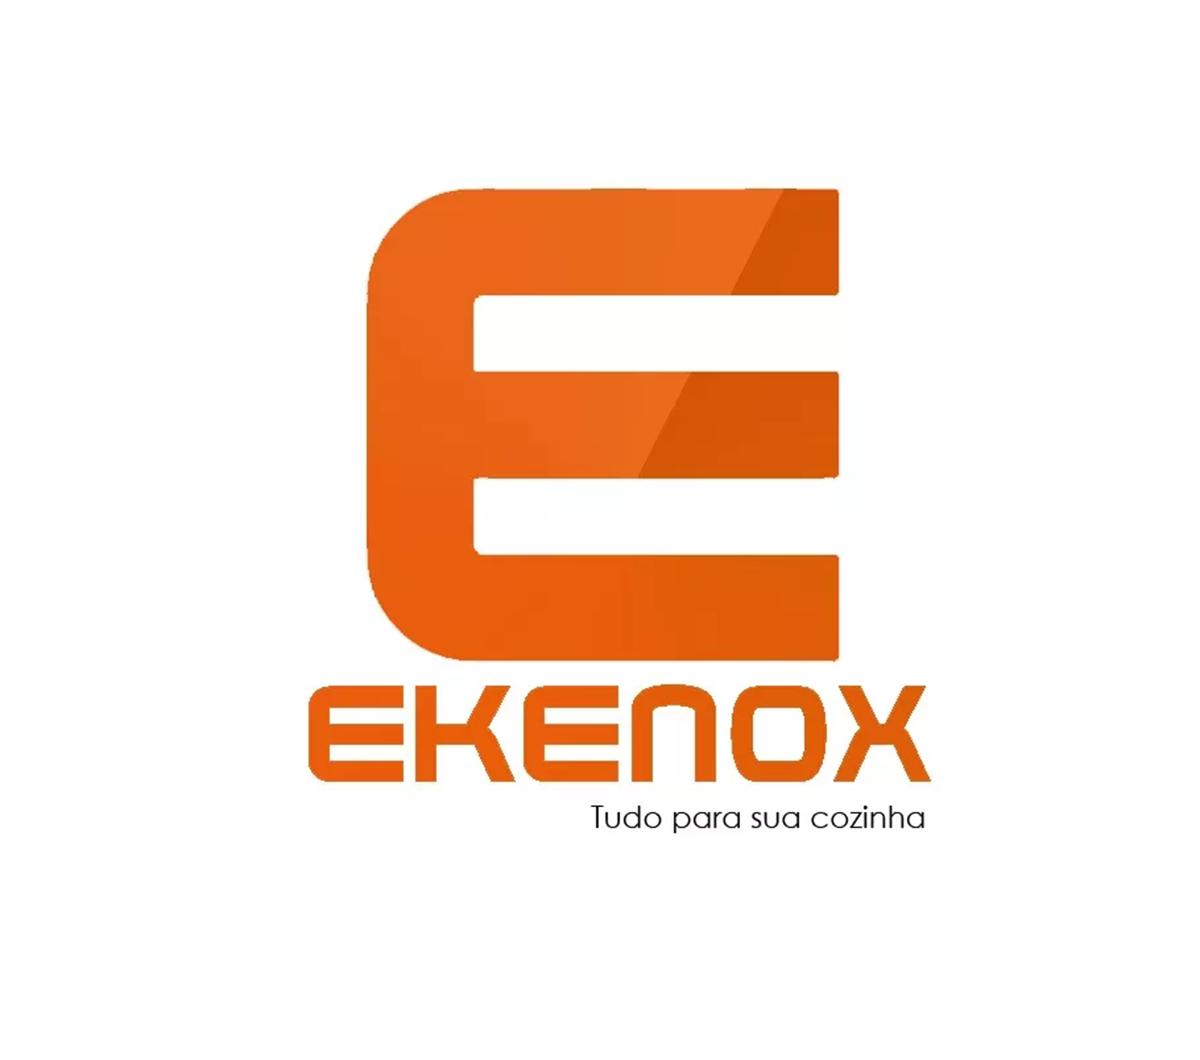 Conservador de Batata 2 Cubas Ekenox  - EKENOX- Equipamentos Industriais